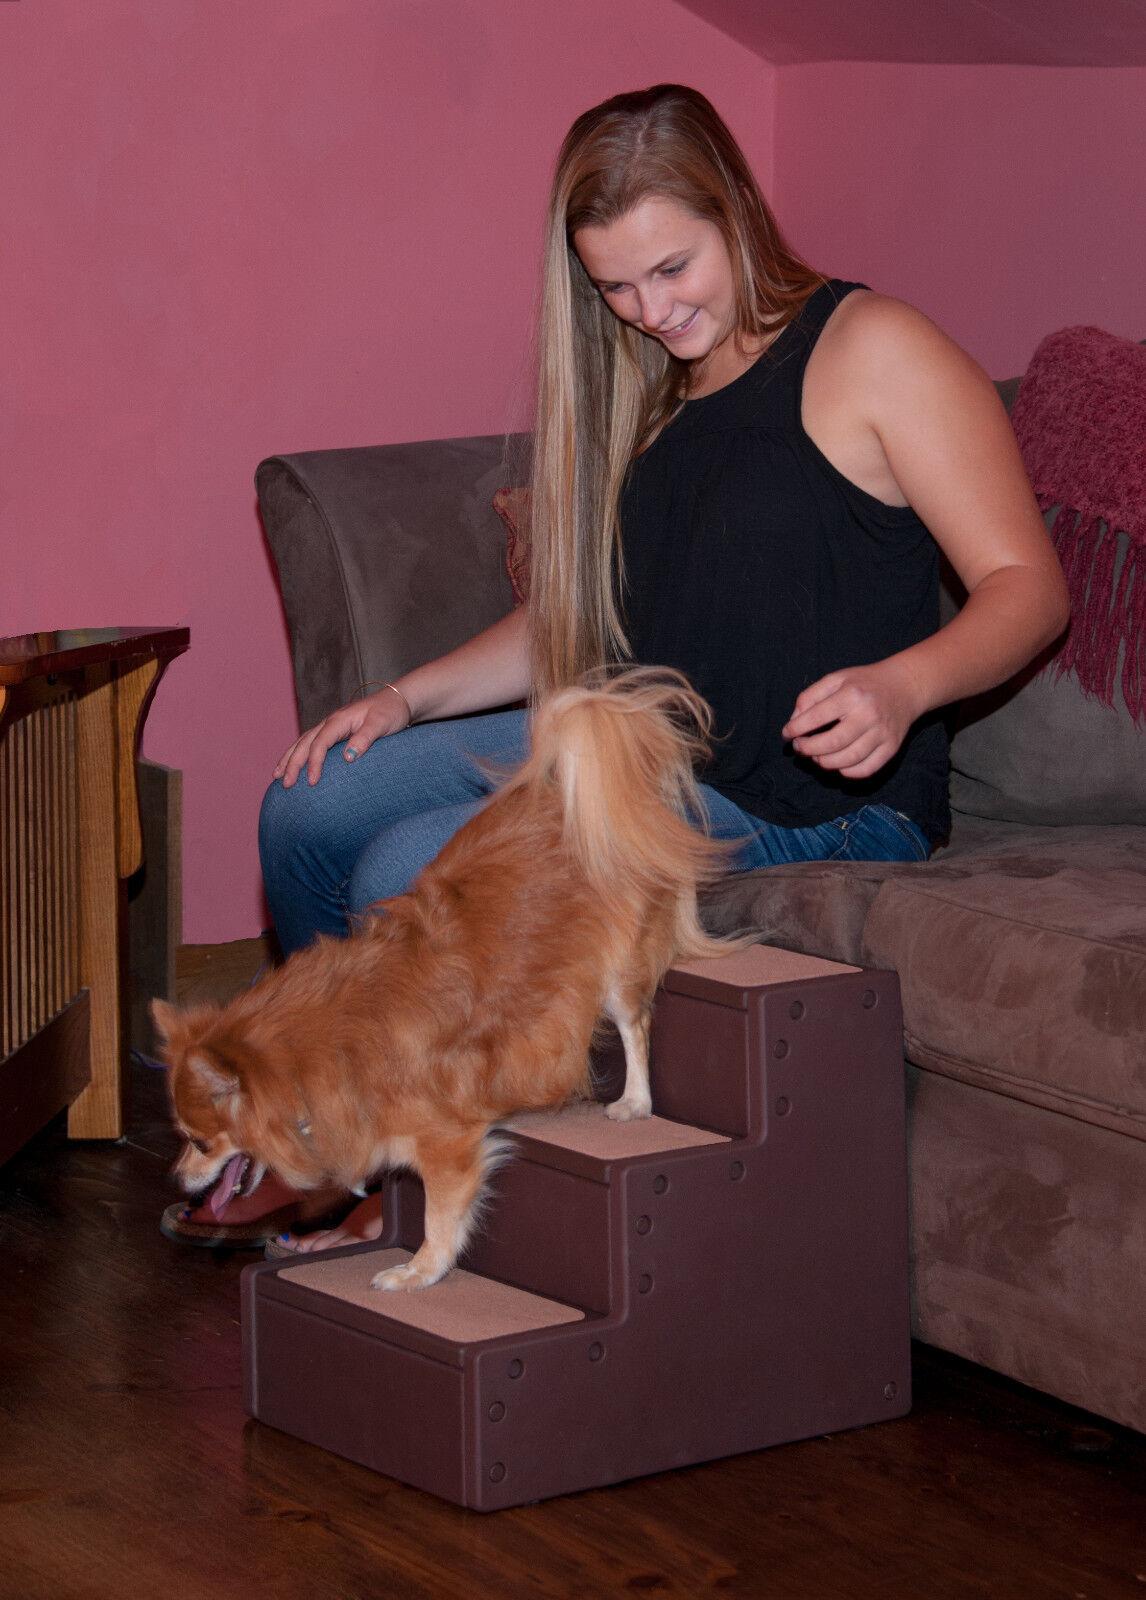 sconto Pet Gear NEW Easy Pet Pet Pet Step III & IV Dog Cat Stairs Ramp, Chocolate, Two Dimensiones  vendita online sconto prezzo basso